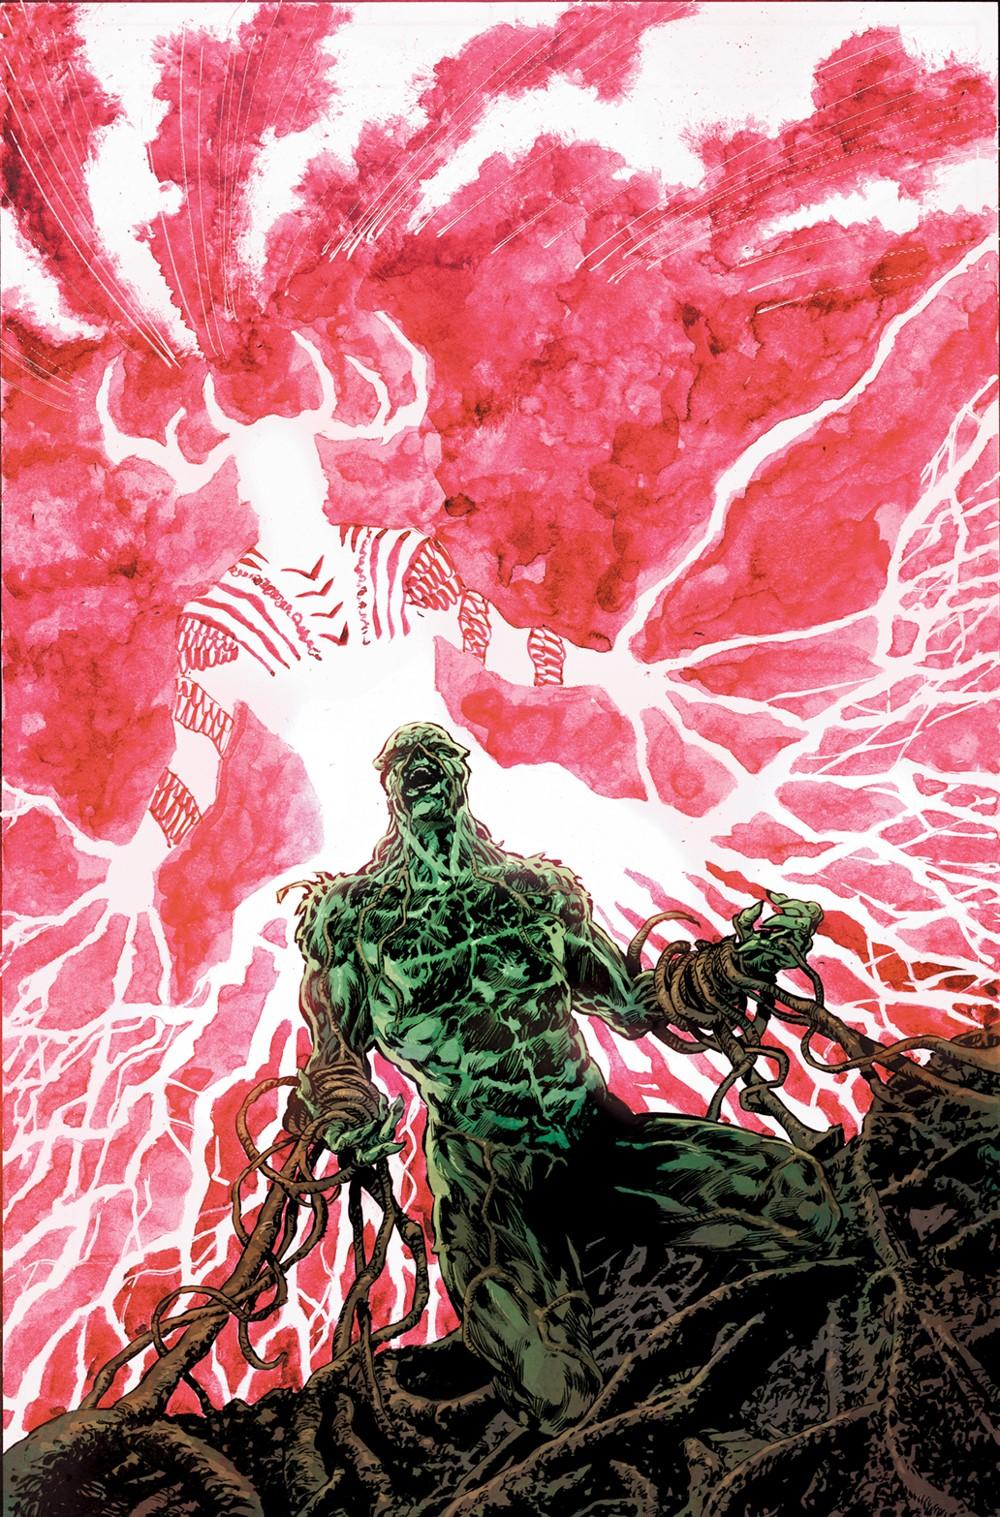 The_Swamp_Thing_Cv10 DC Comics December 2021 Solicitations